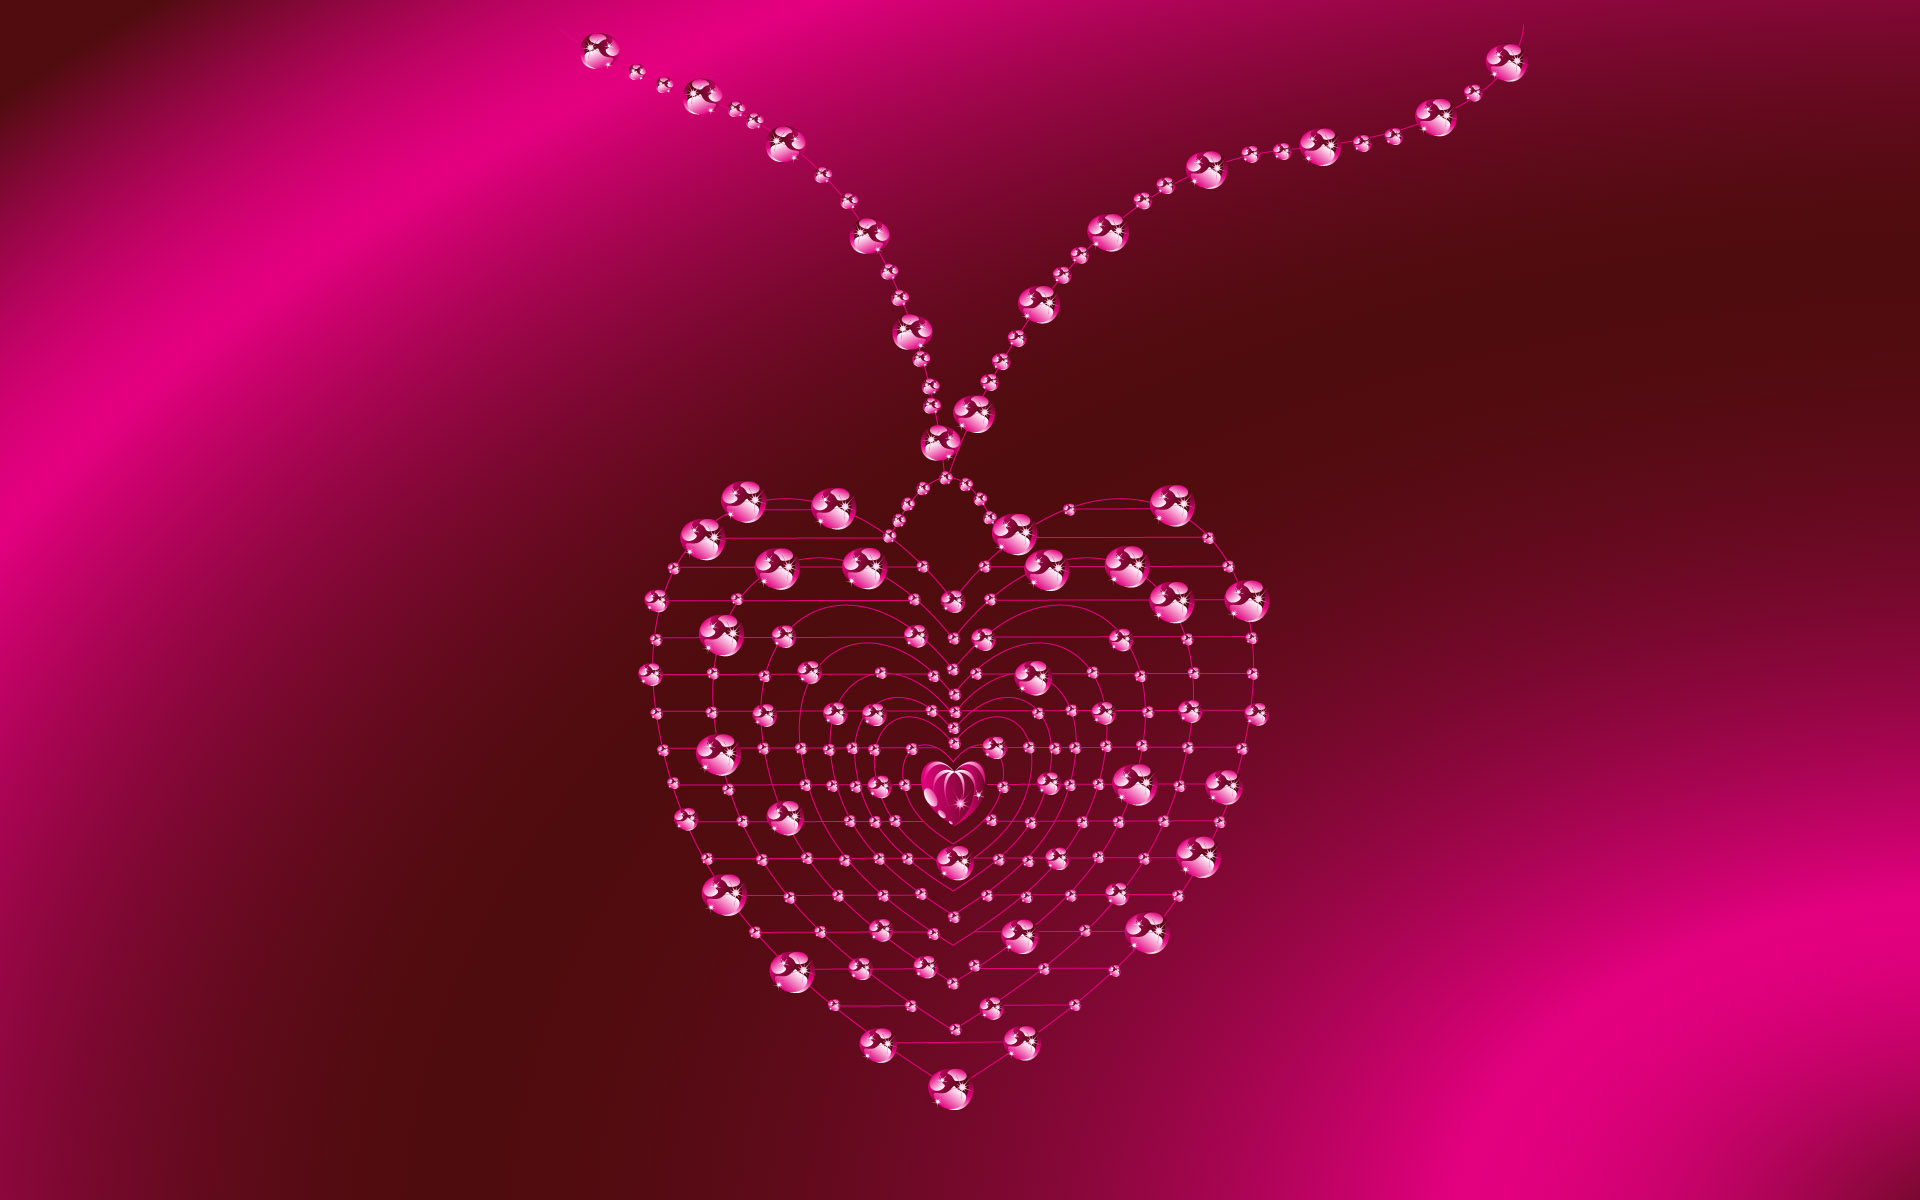 beautiful heart valentine day wallpaper1 1920x1200